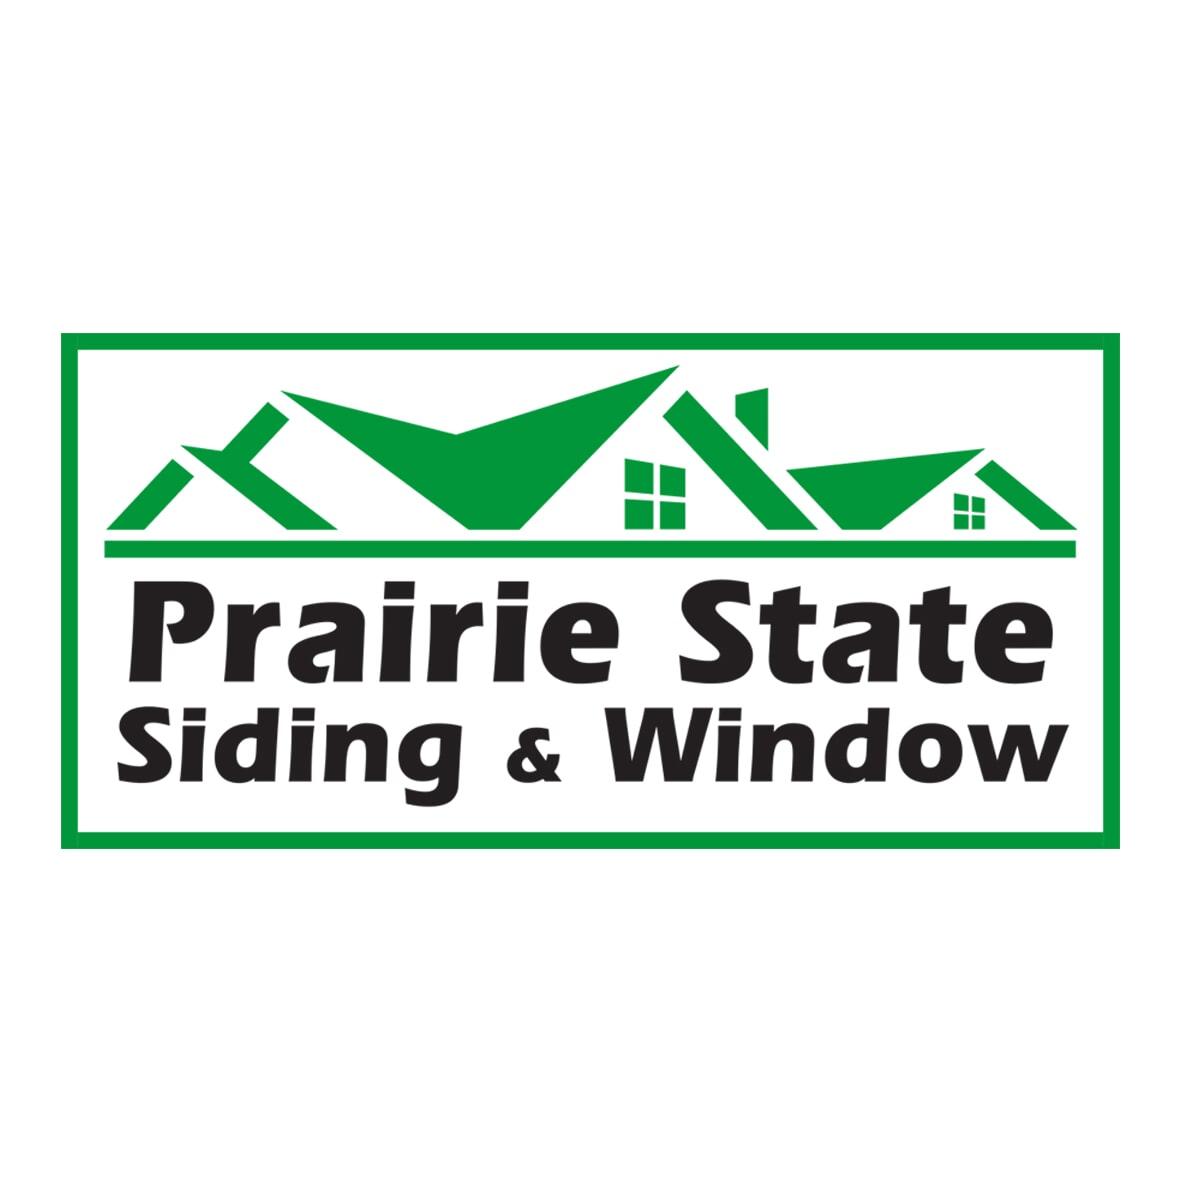 Prairie State Siding & Window image 6